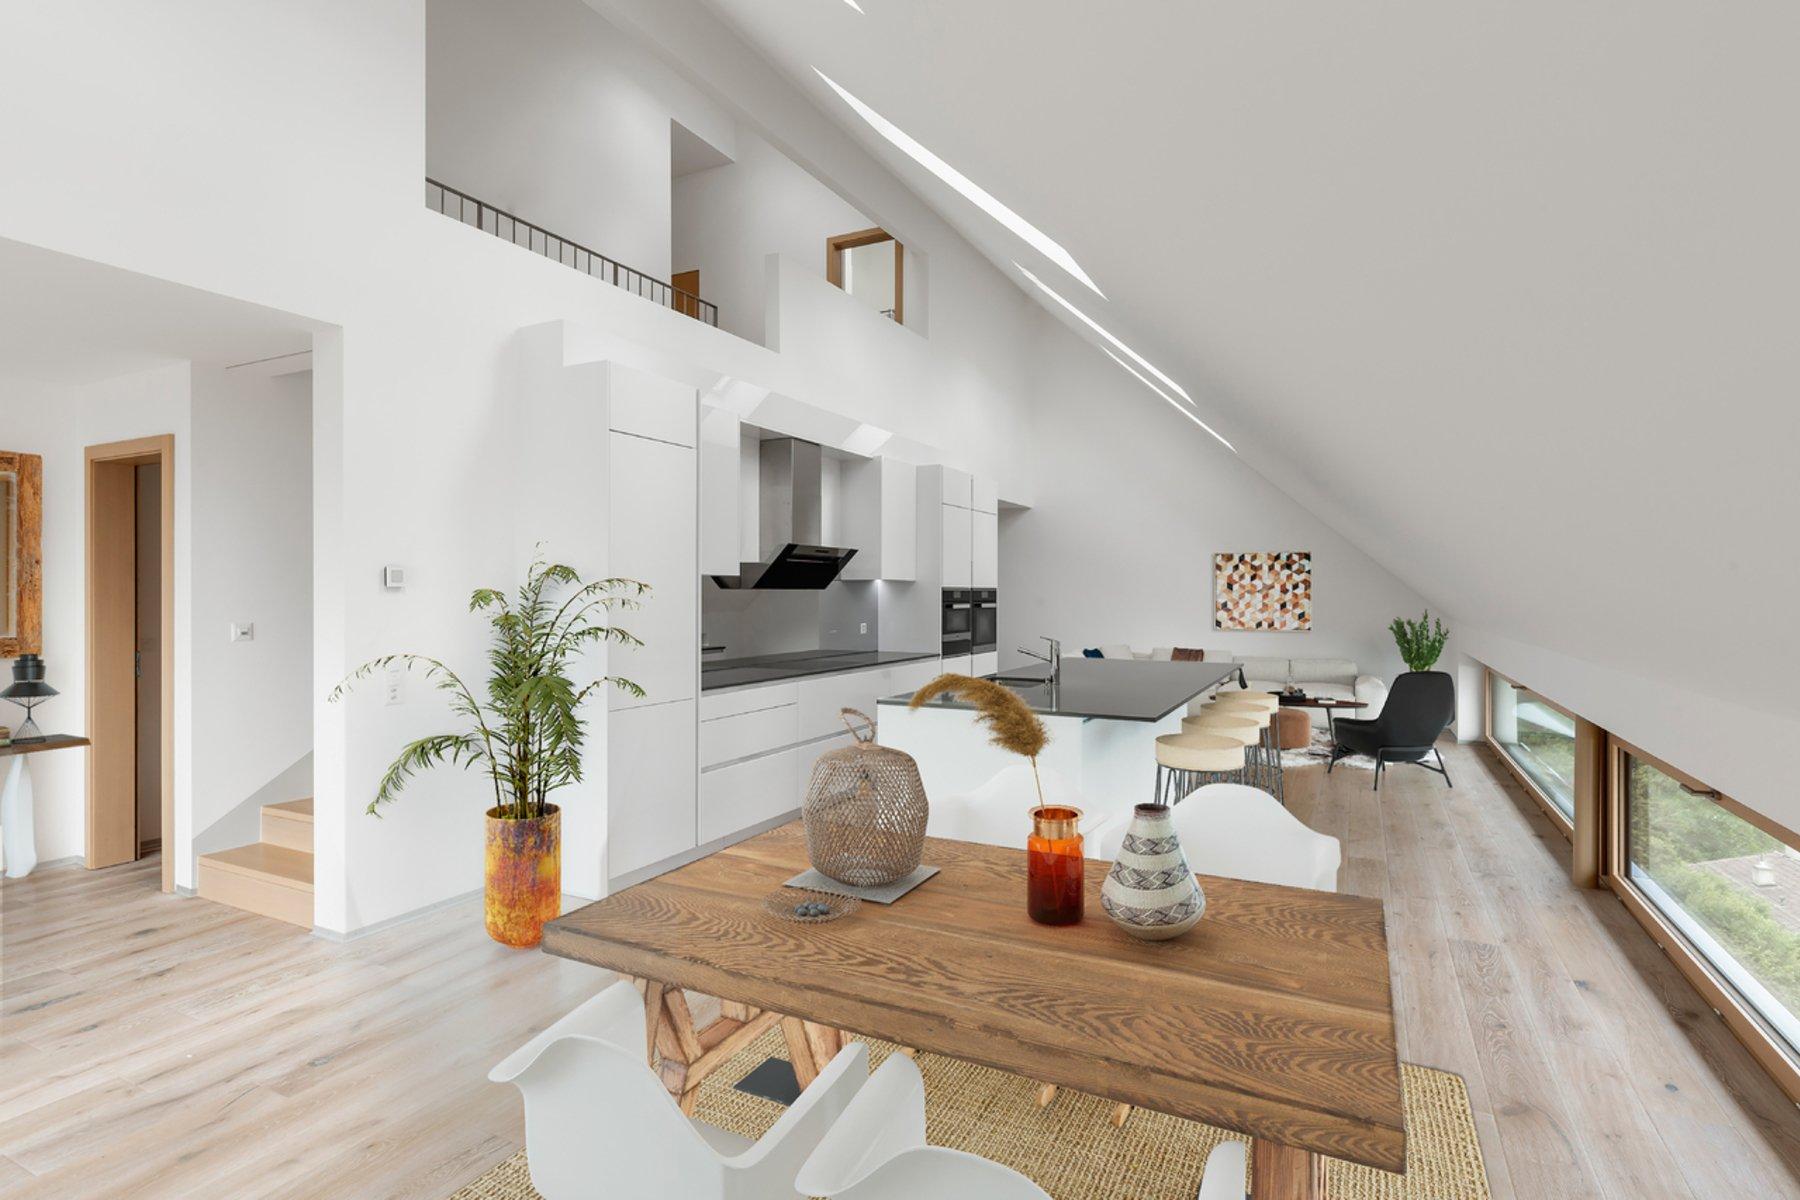 Apartment in Chardonne, Vaud, Switzerland 1 - 11014382